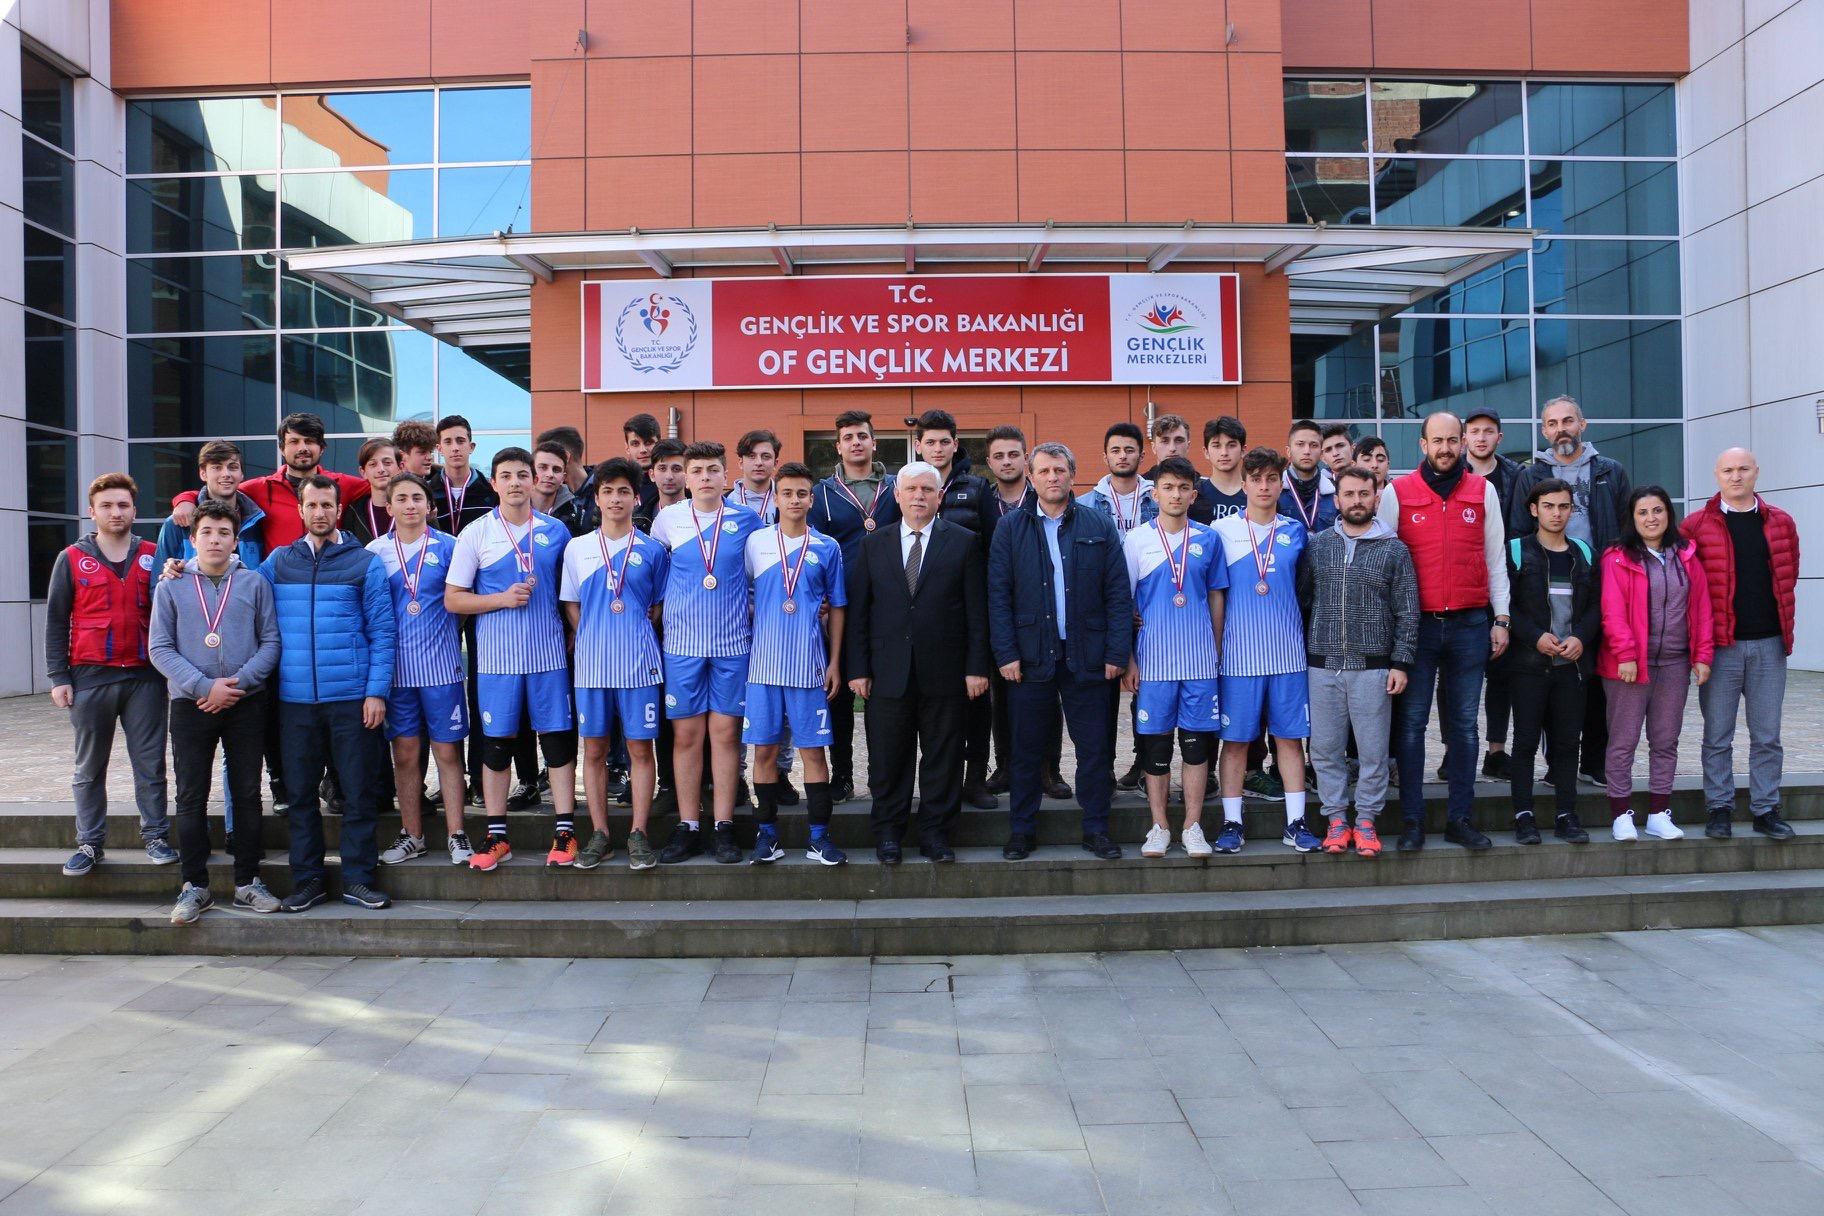 Voleybolda Şampiyon, Of Hacı Mehmet Bahattin Ulusoy MTA Lisesi